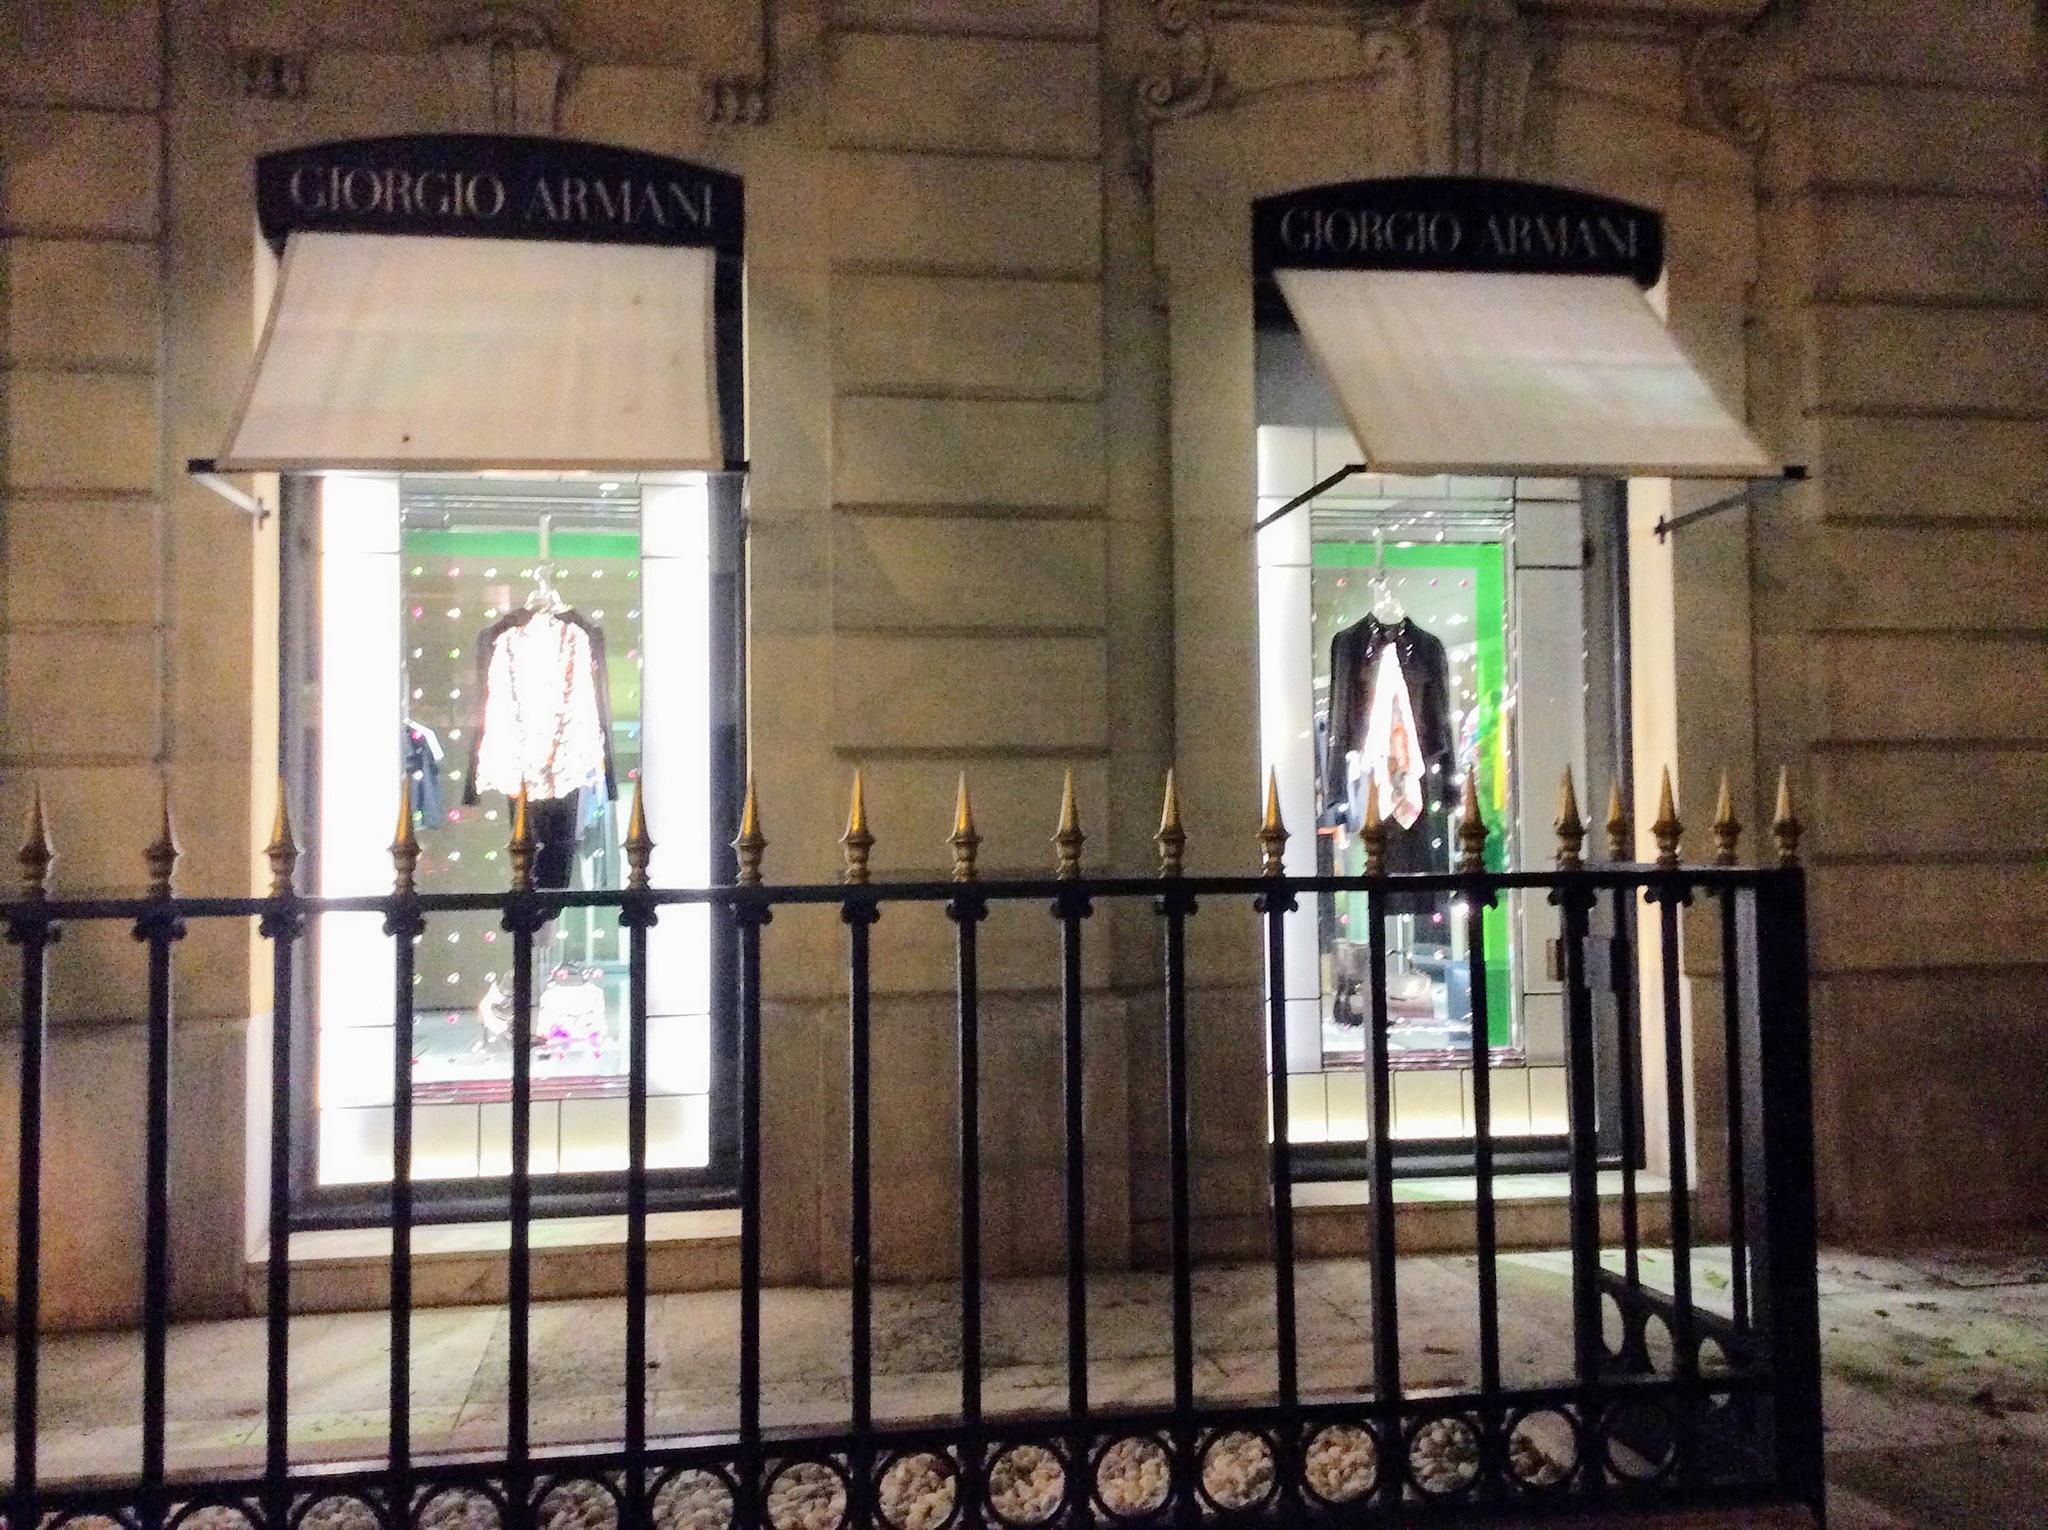 Avenue Montaigne Paris Fashion Windows - Giorgio Armani